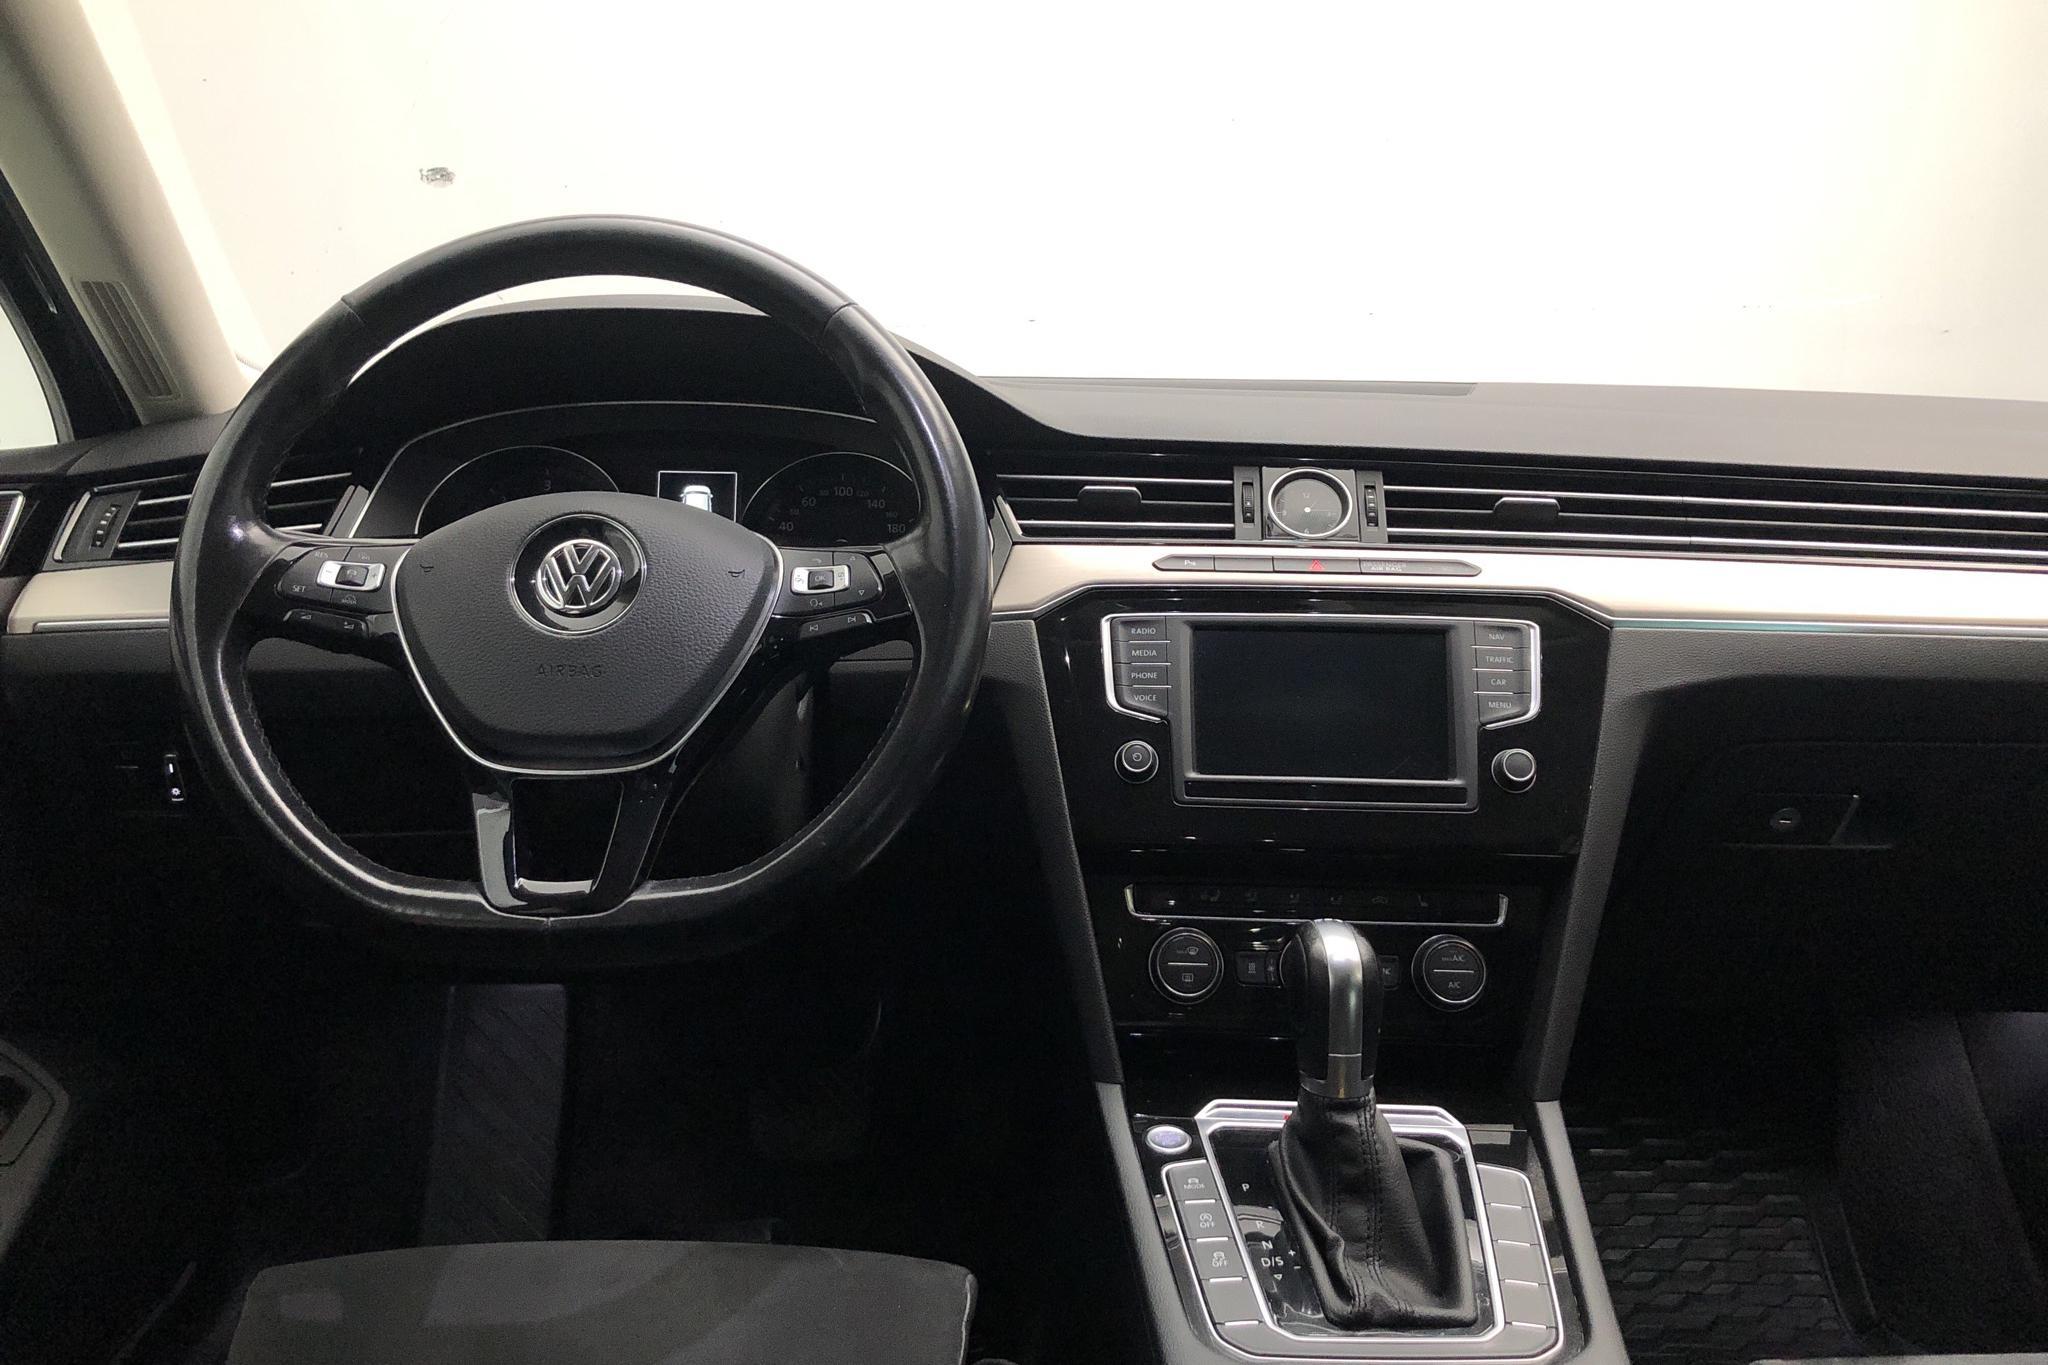 VW Passat 2.0 TDI Sportscombi 4MOTION (190hk) - 177 900 km - Automatic - Dark Grey - 2016